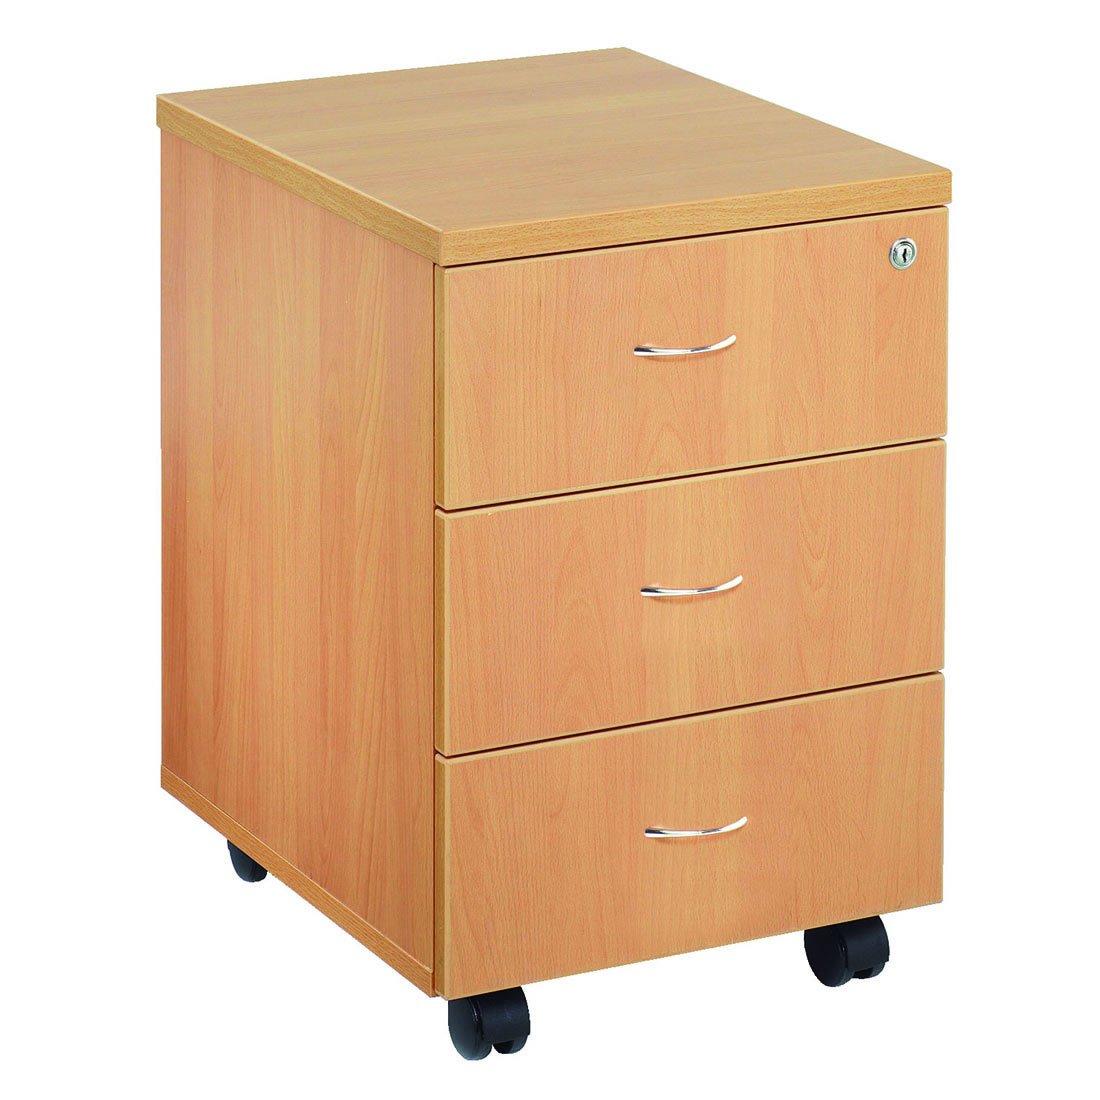 Office Filing Cabinet w/ Mobile Wheels   3 BOX Drawers Pedestal   Oak       Office Productsreview